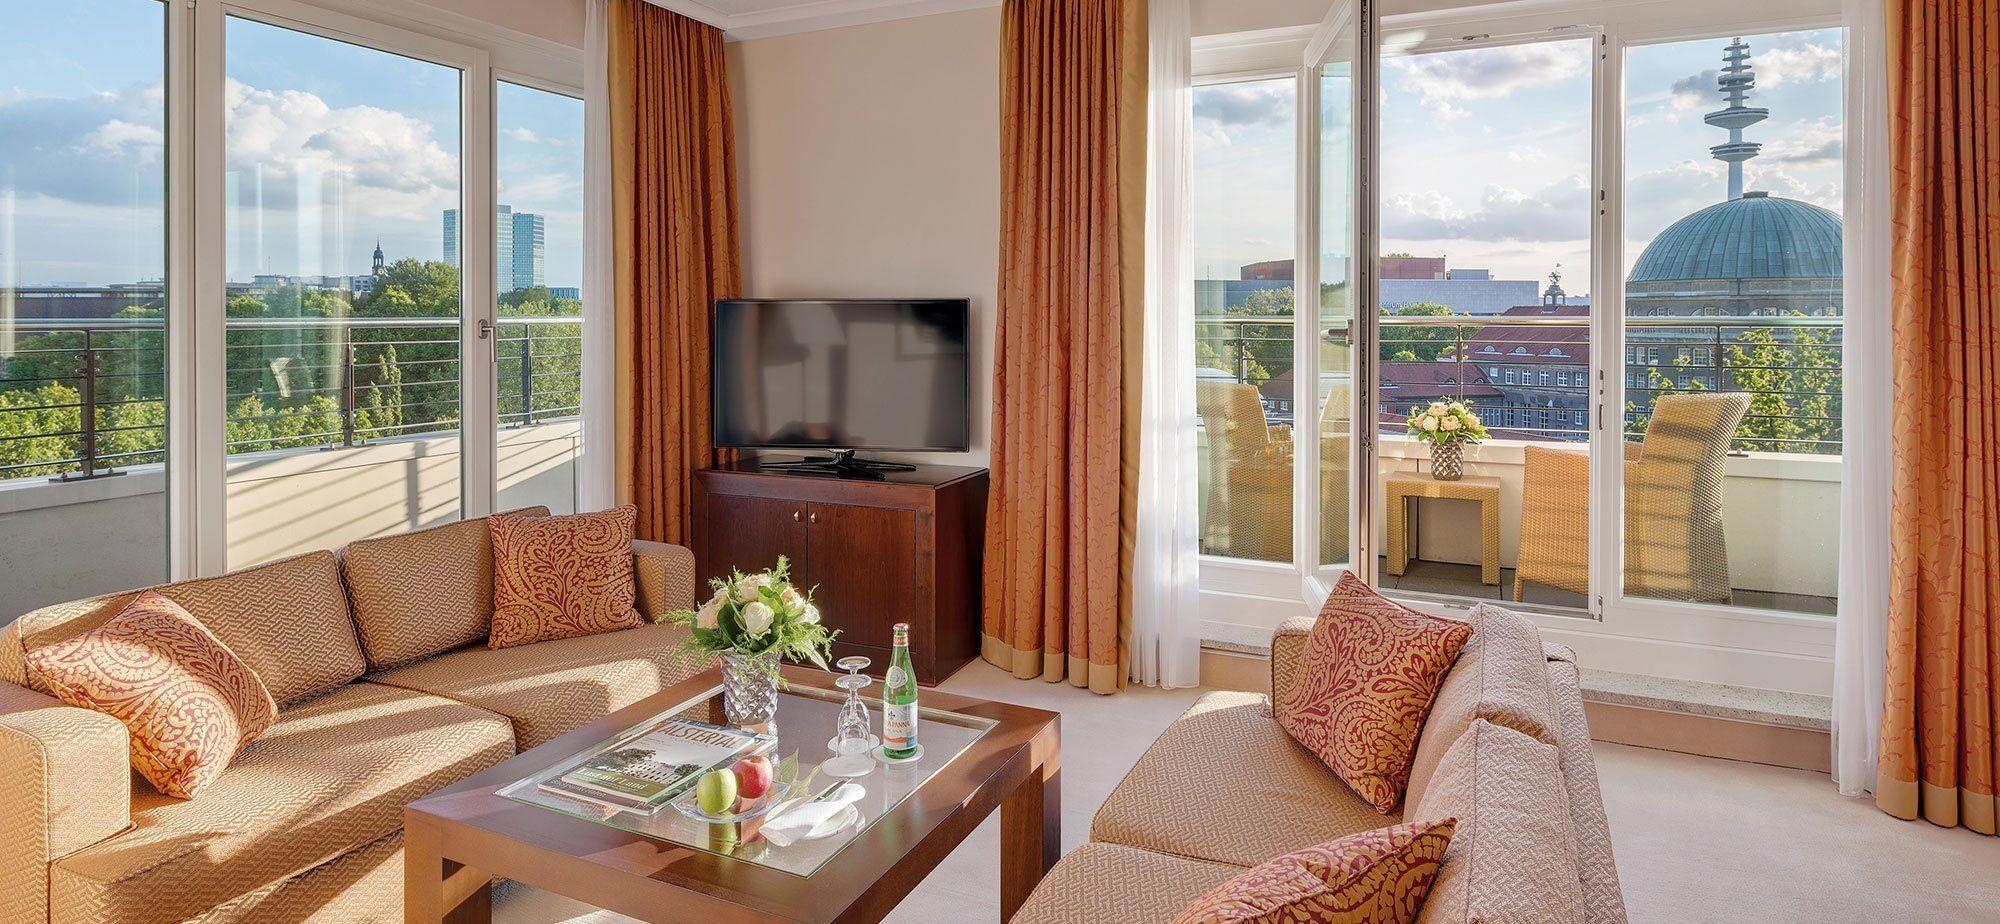 Penthouse Ecksuite Elysee Hotel Ag Hamburg